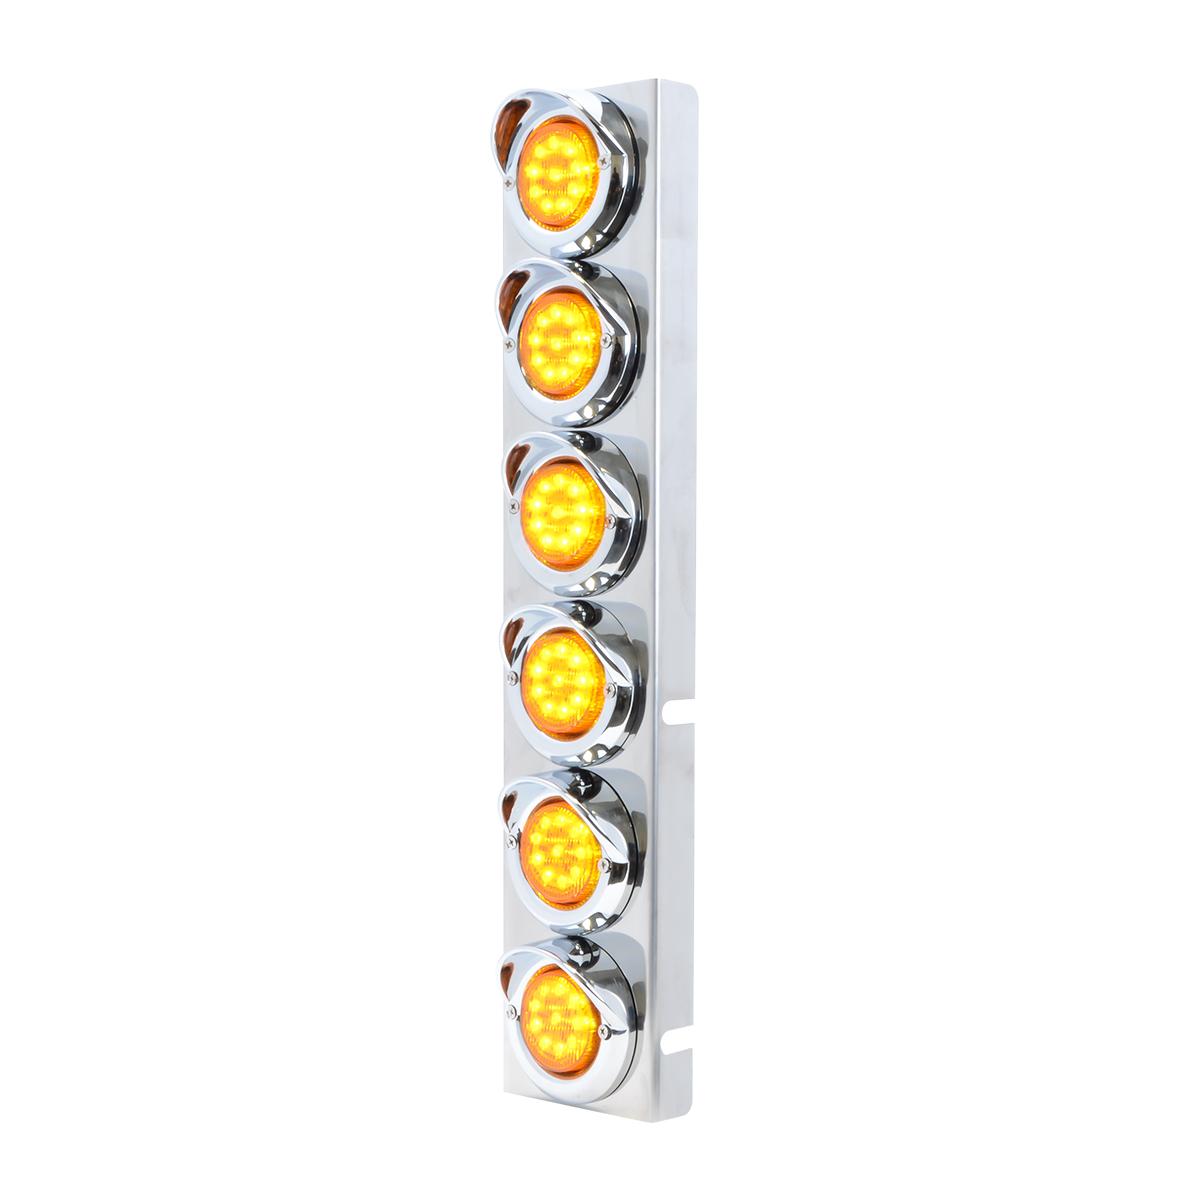 "97264 19.5"" Air Cleaner Light Kit for Pete"